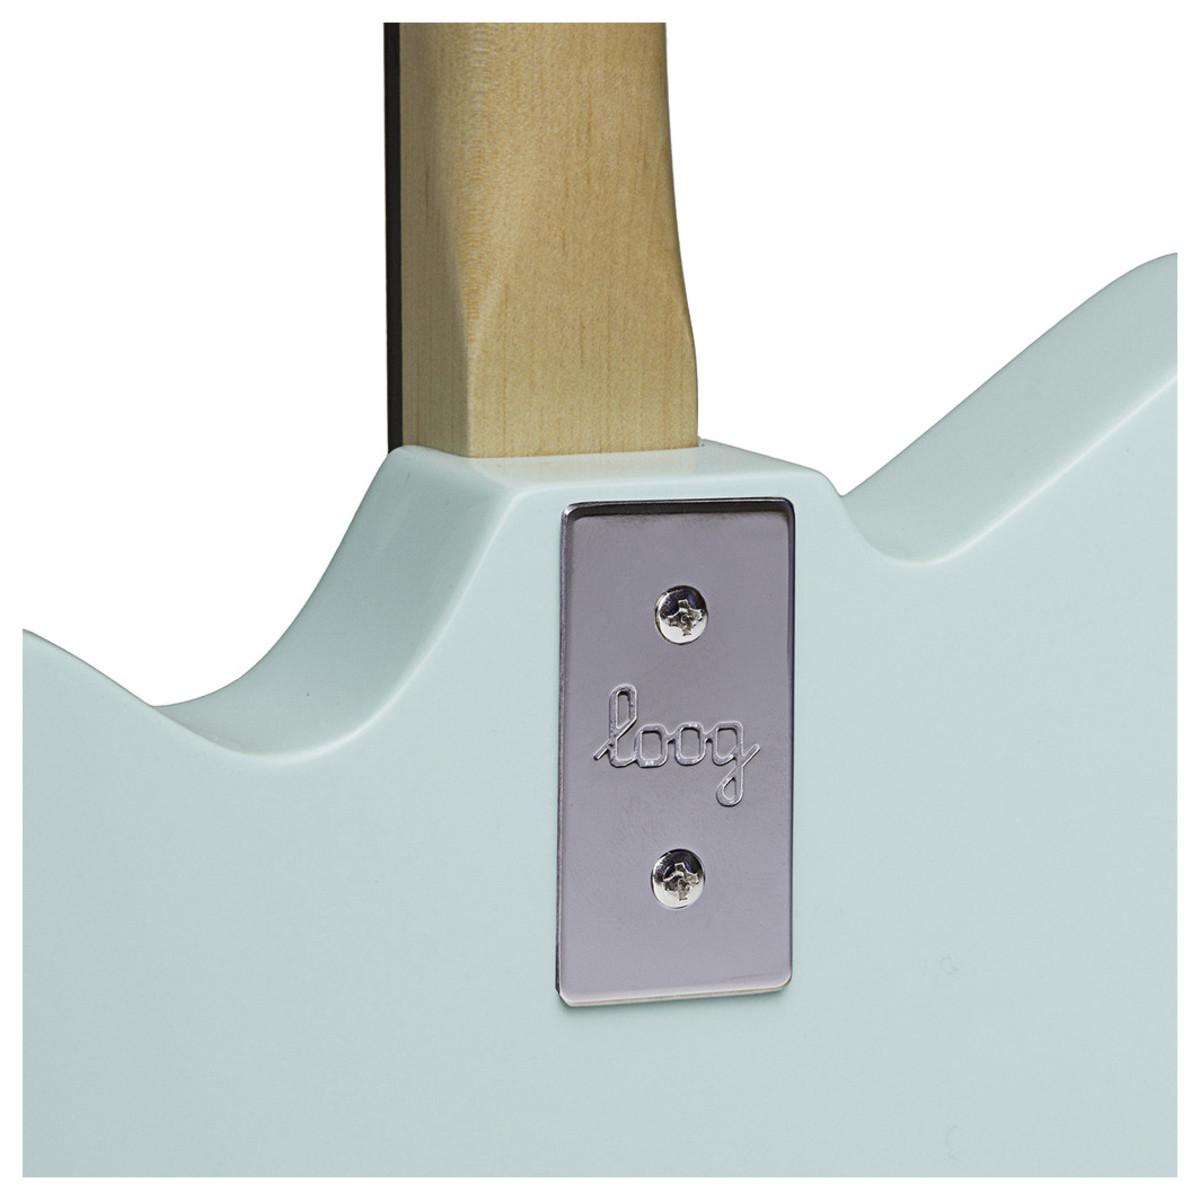 Guitar Amp Power Switch Wiring As Well As Gibson Ripper Bass Wiring